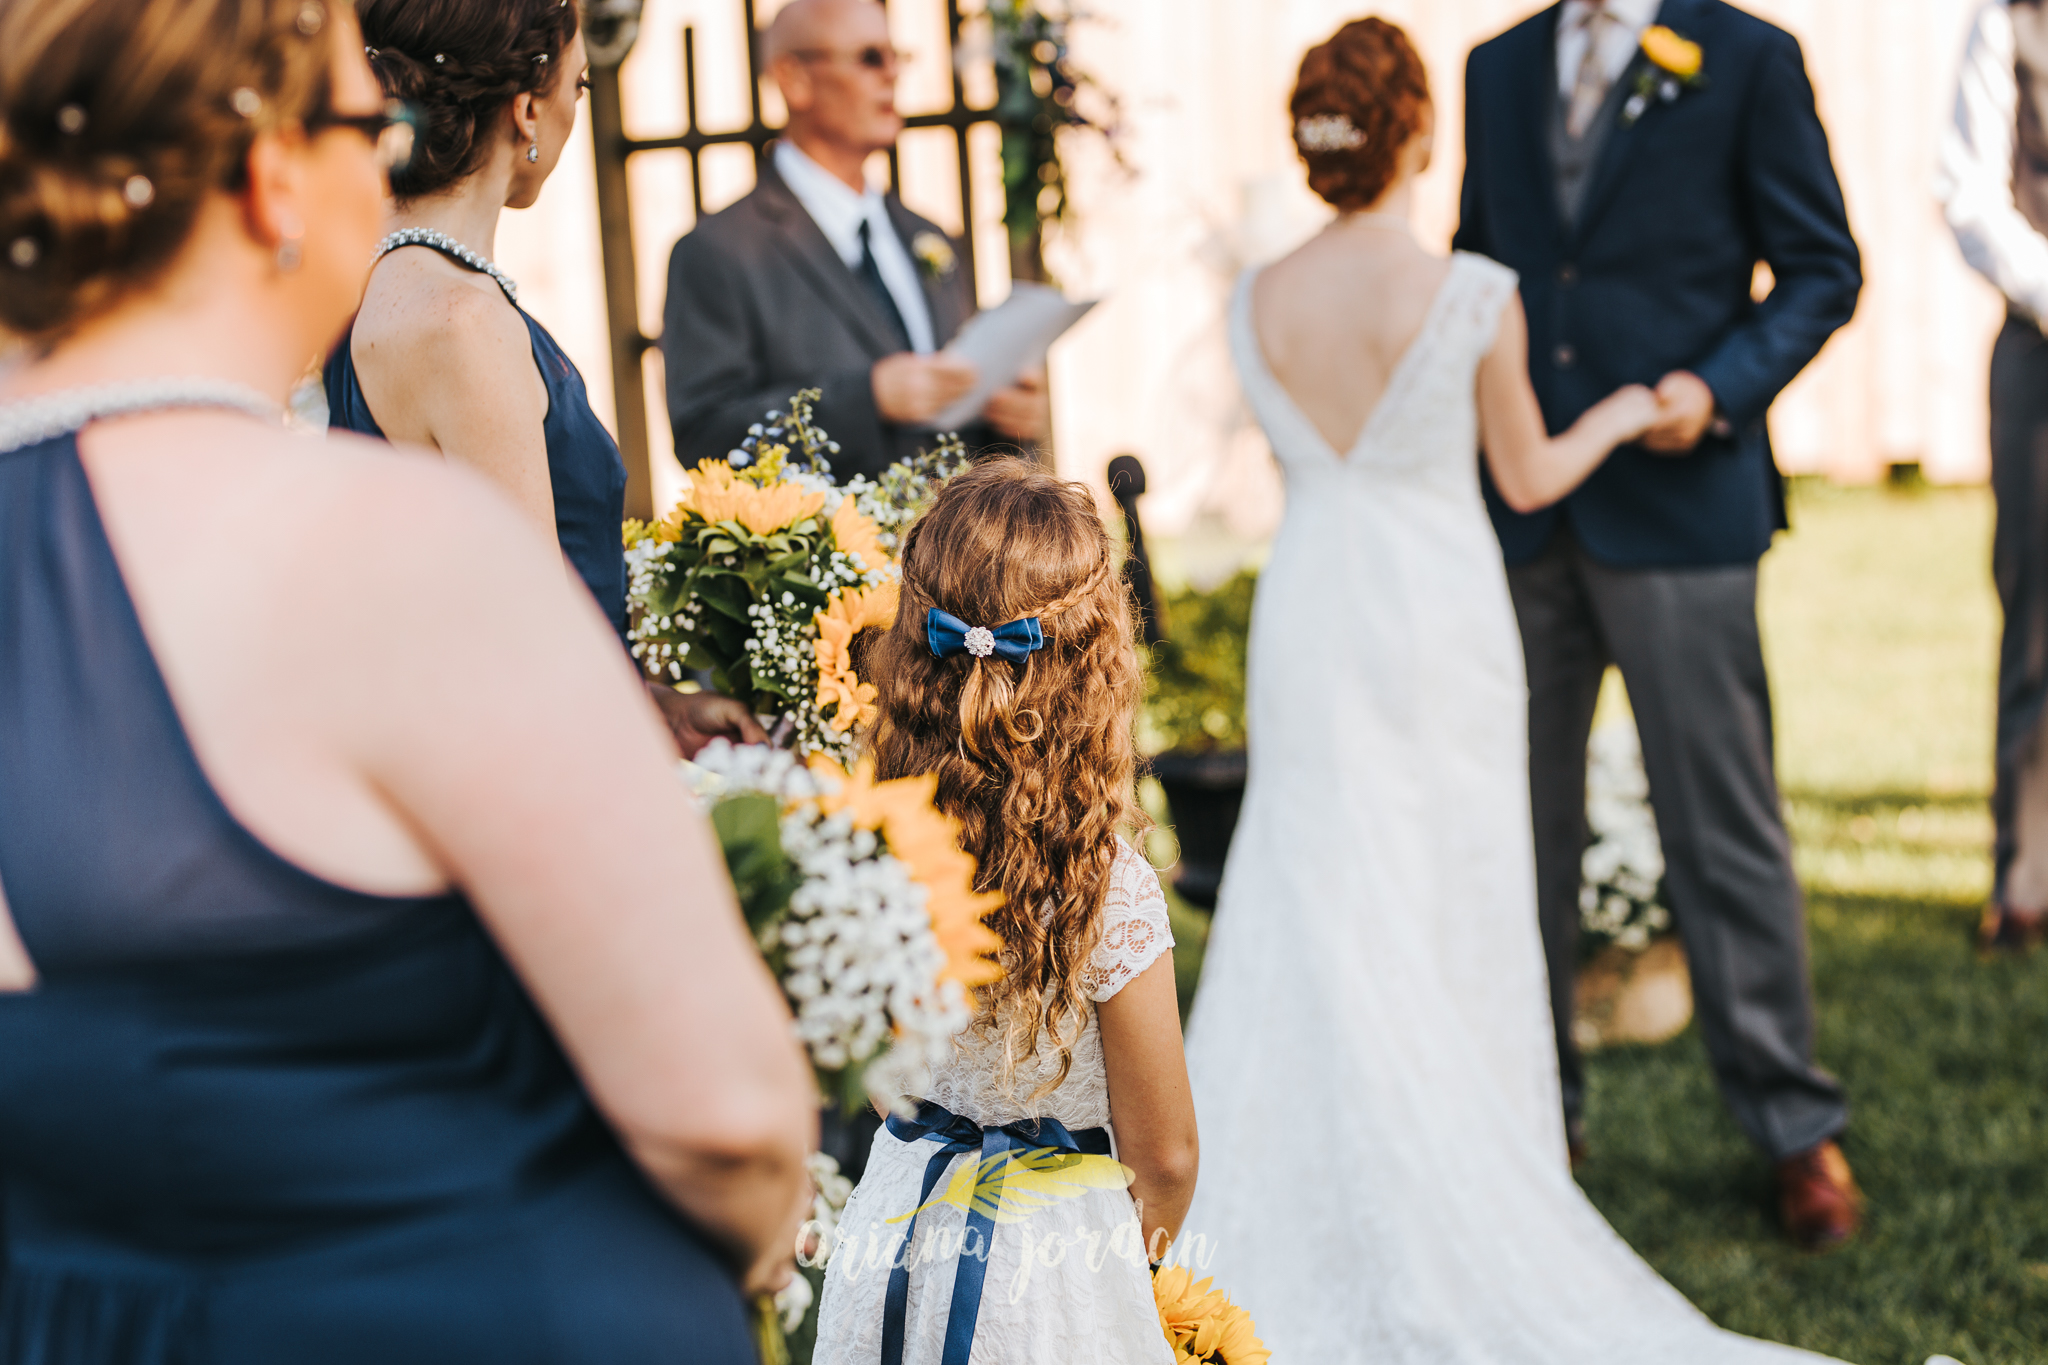 071 Ariana Jordan Photography -Moonlight Fields Lexington Ky Wedding Photographer 4585.jpg